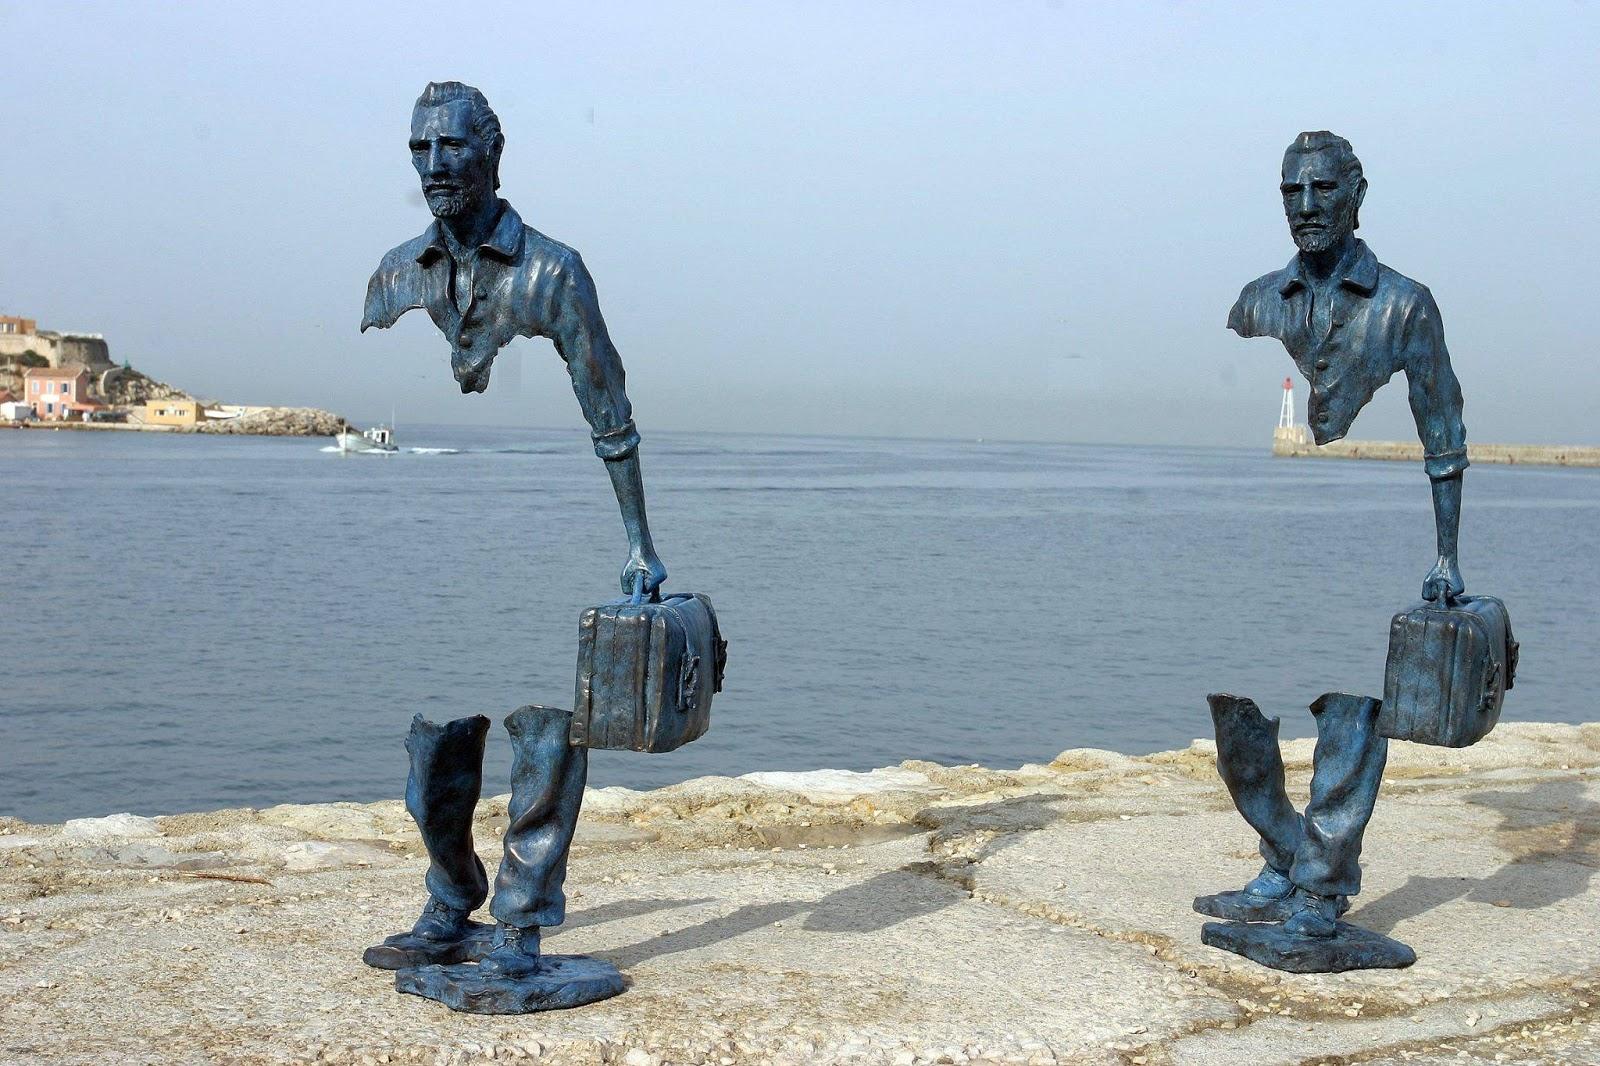 7 Esculturas Públicas Fascinantes